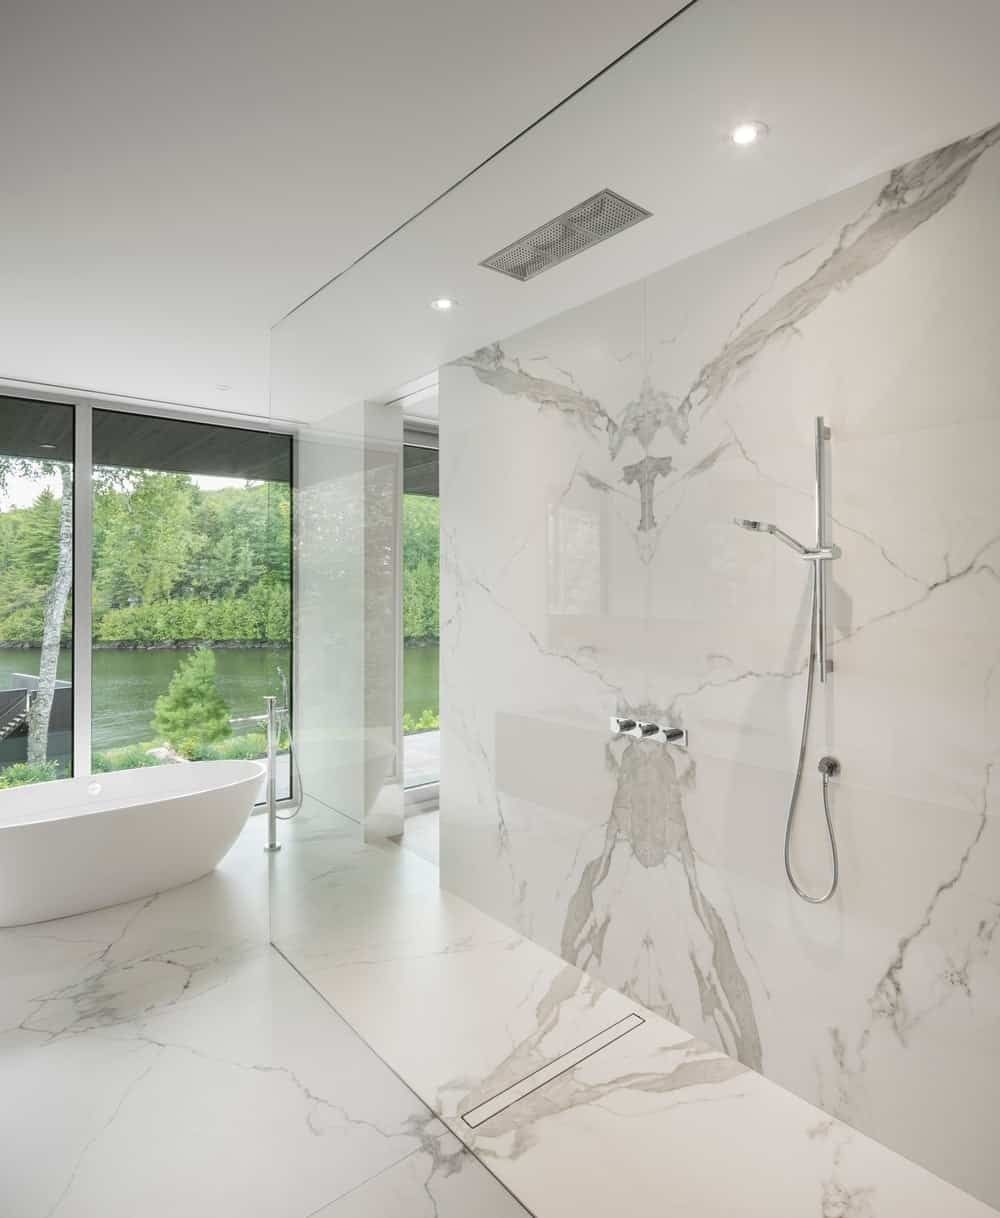 33 Elegant White Primary Bathroom Ideas 2021 Photos Modern Master Bathroom Modern Bathroom Design Bathroom Tile Designs